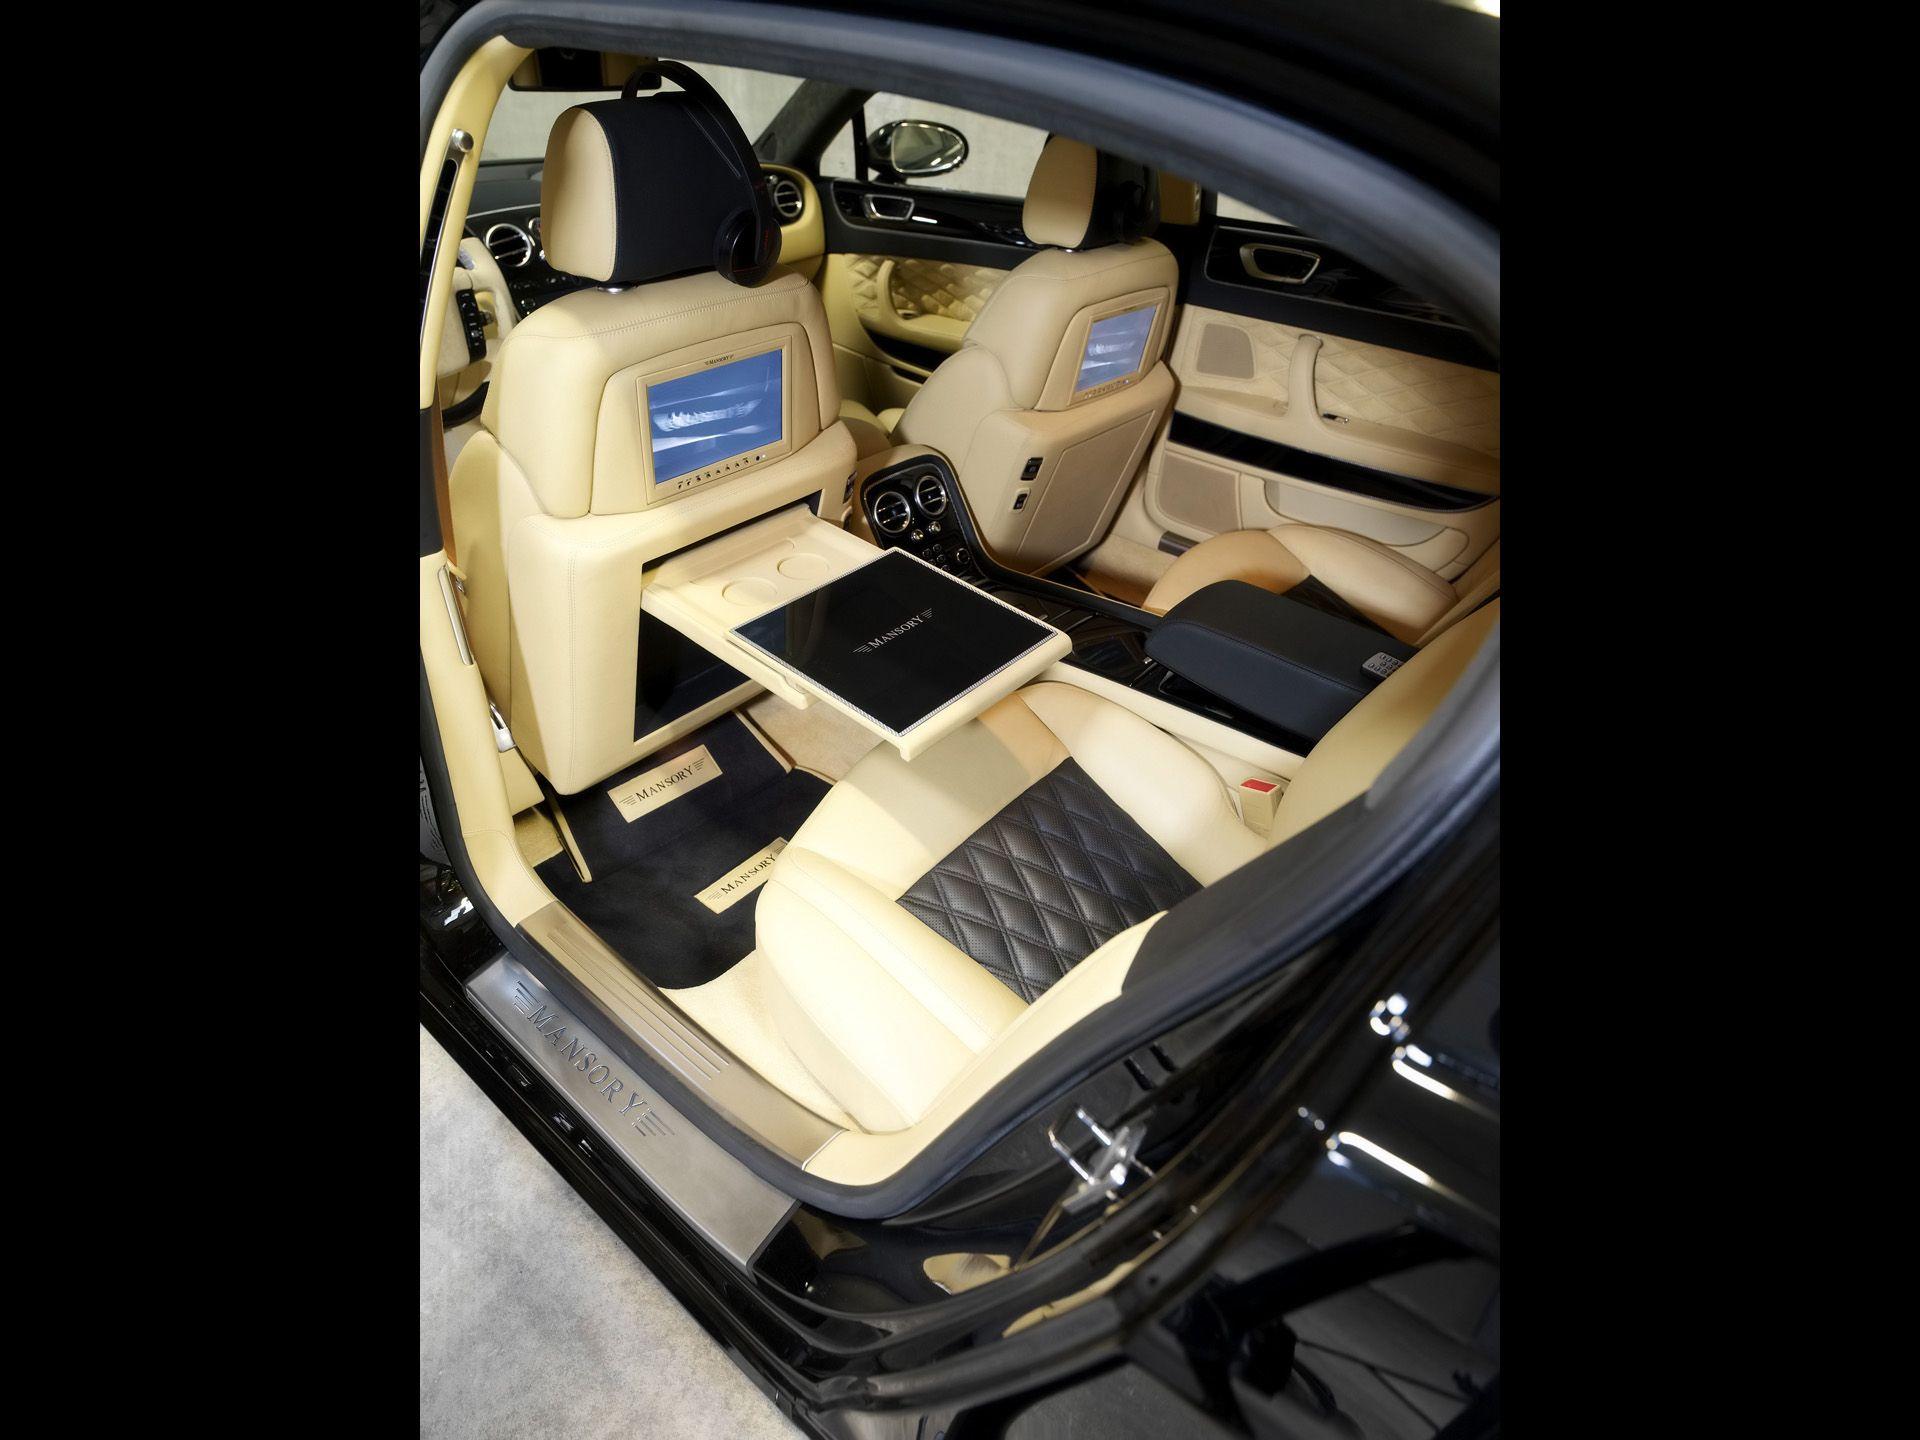 car bentley bmw convertible rental philadelphia in imagine exotic lifestyles